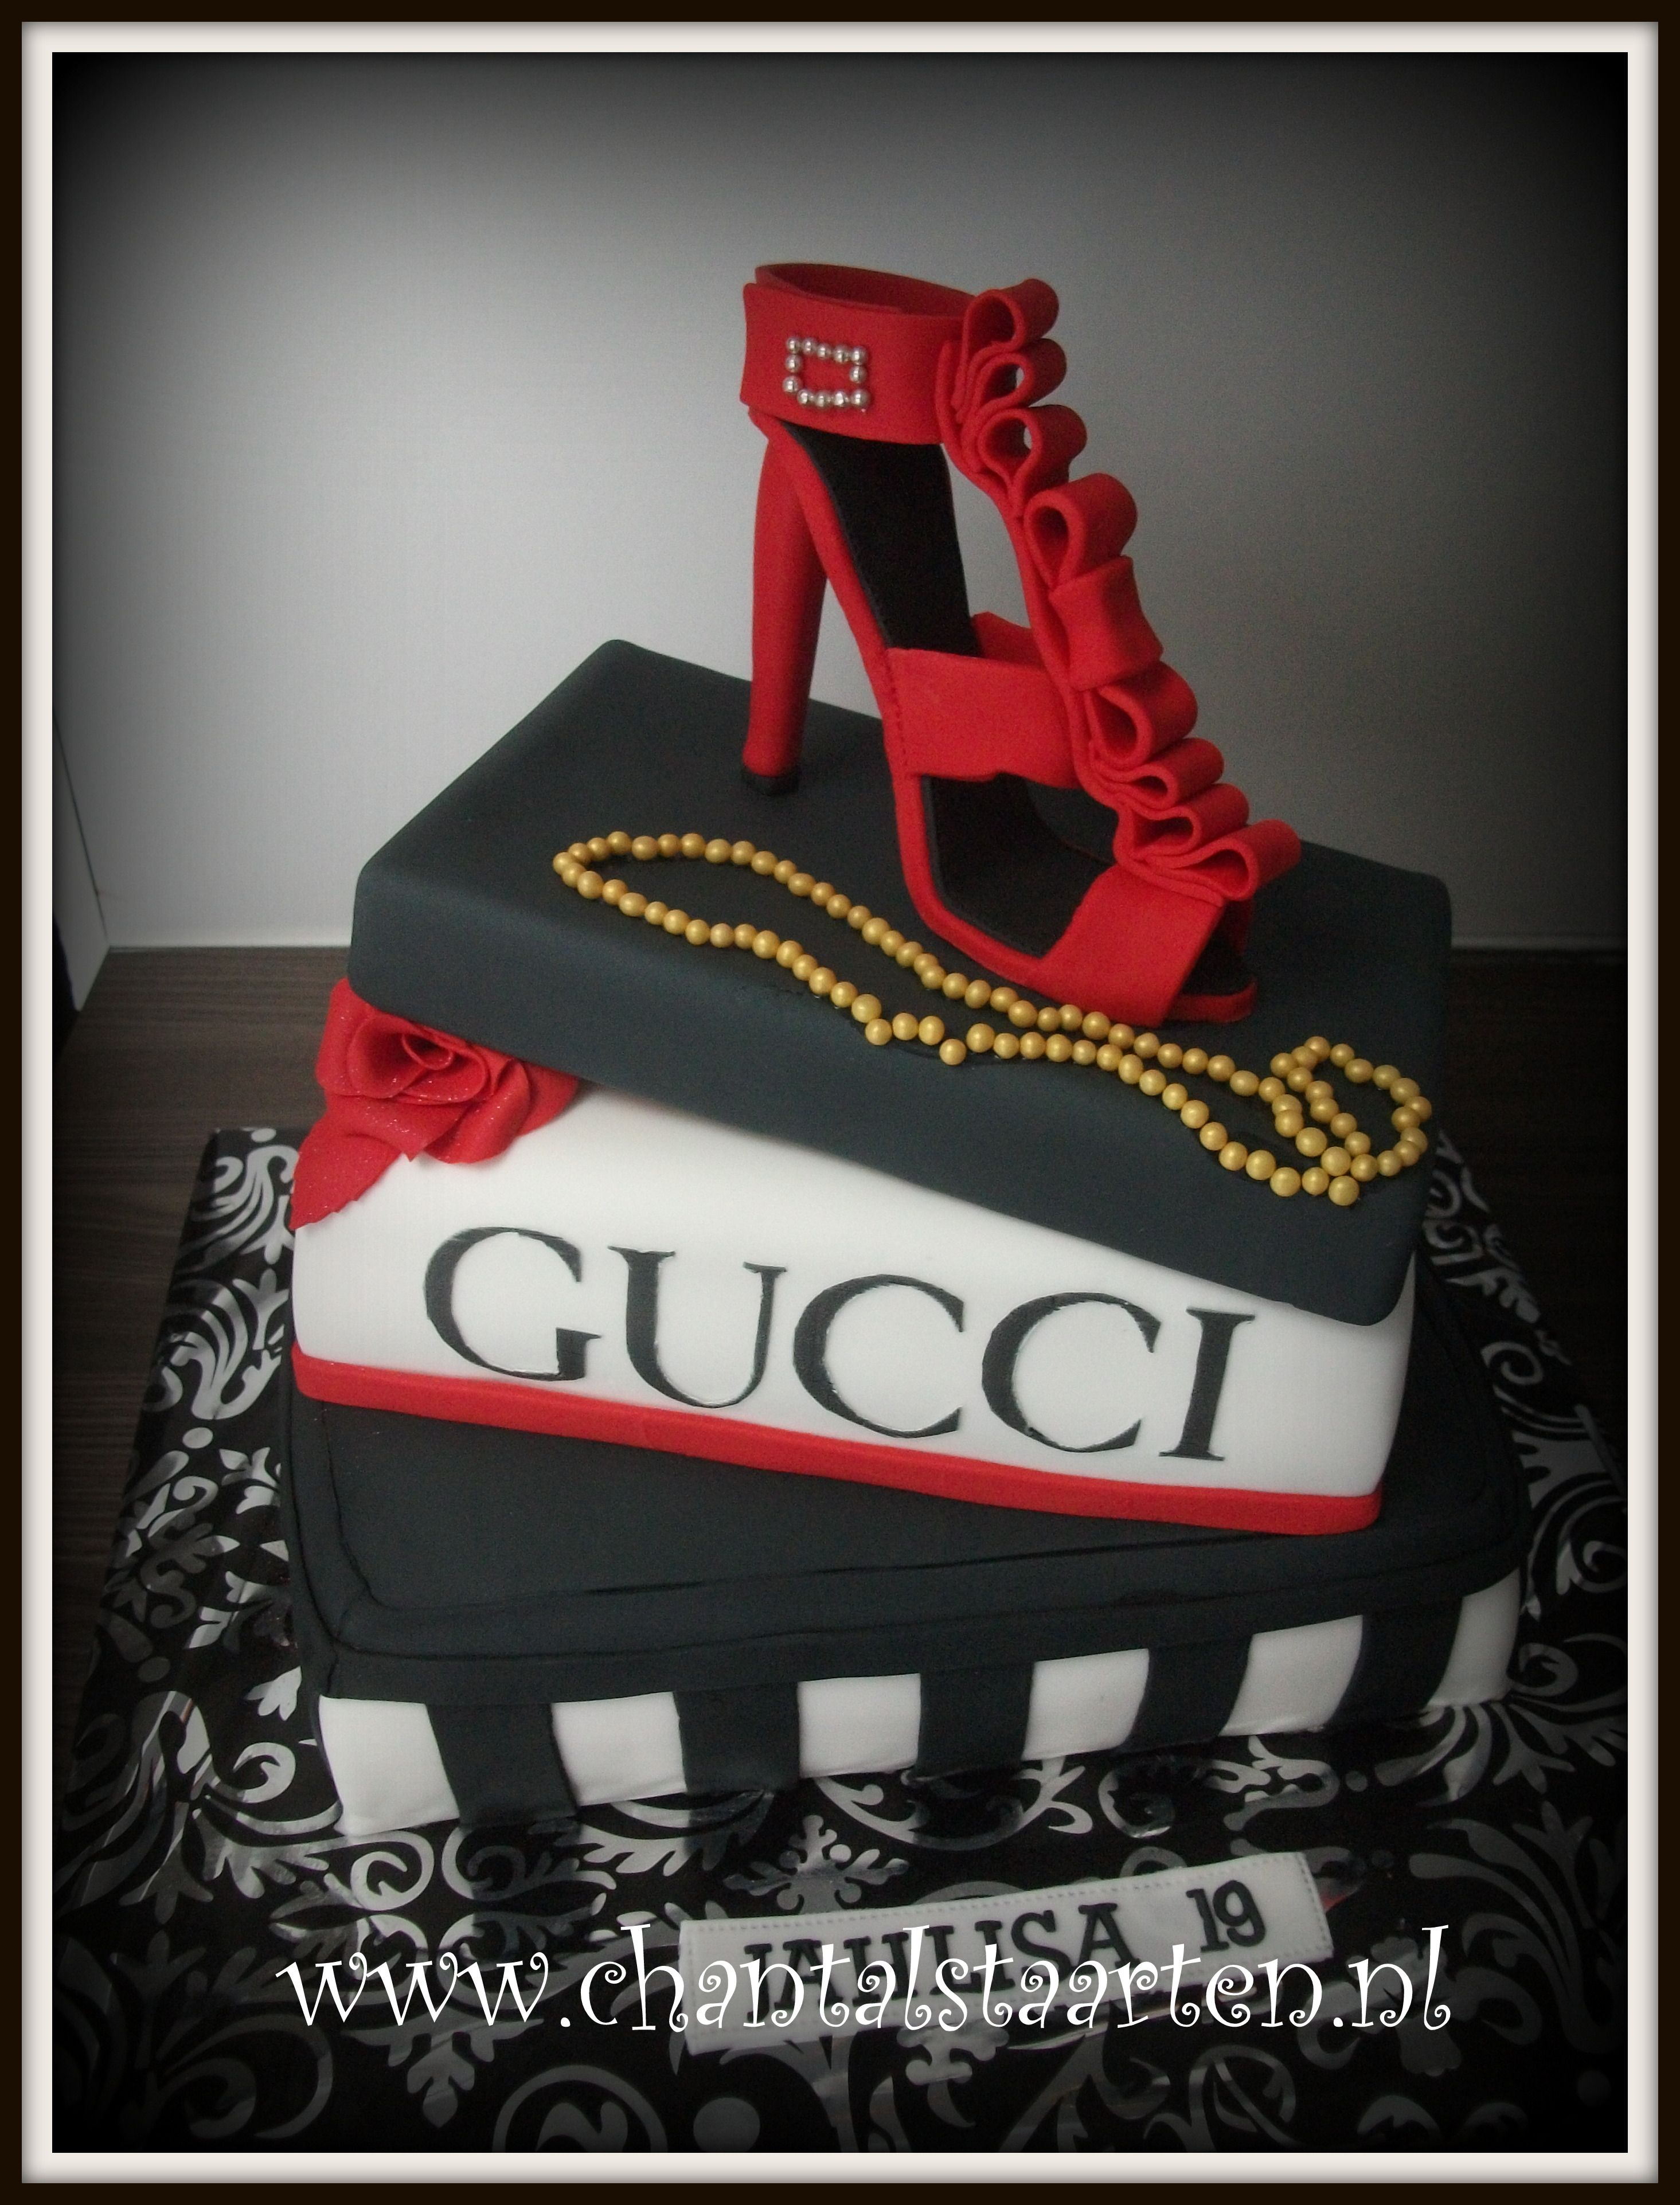 gucci taart gucci taart | Tas taarten | Pinterest   Gucci, Taart en Taarten gucci taart